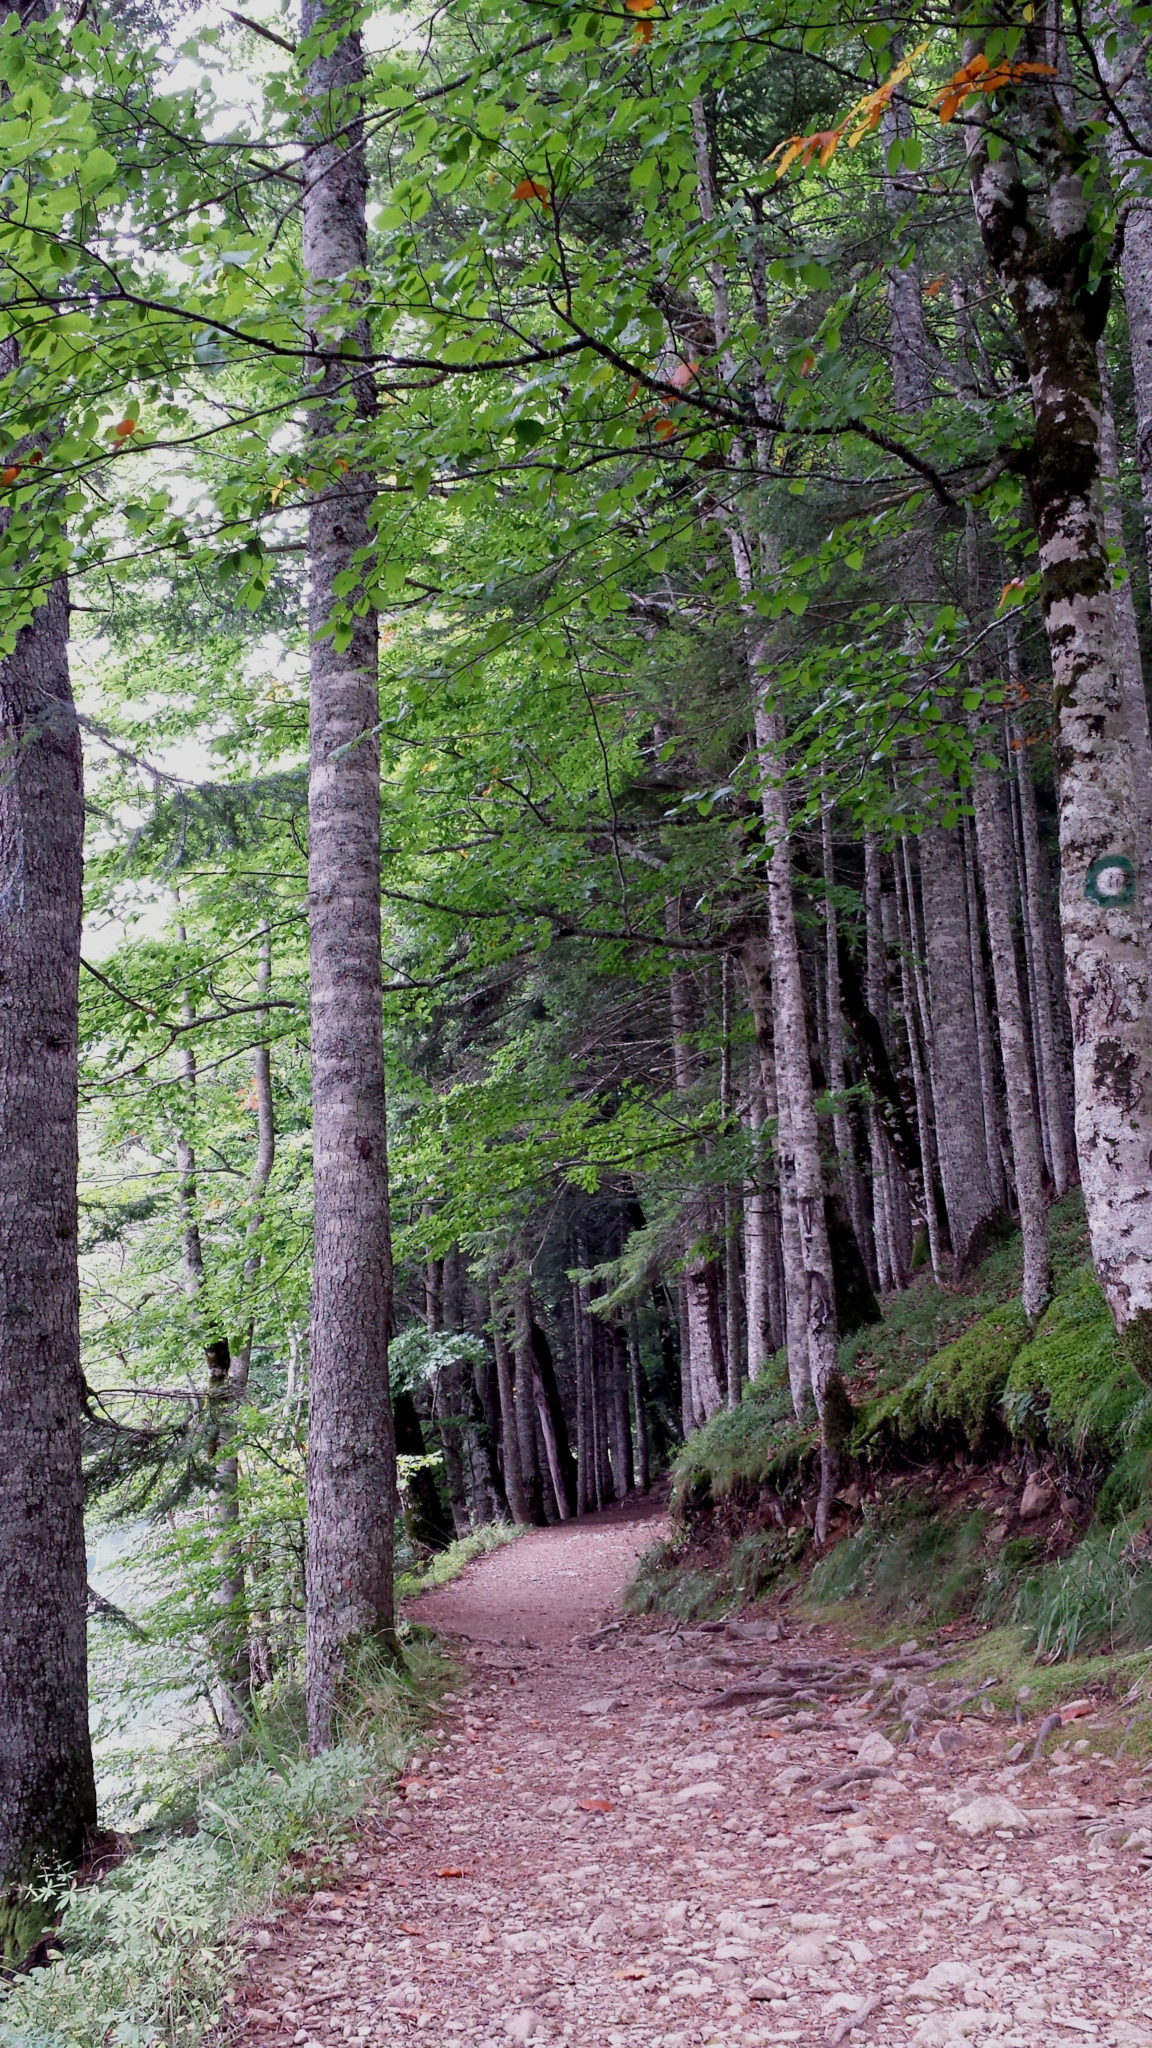 Hema_Montenegro_parc_national_biogradska_gora_forest_travel_voyage_blog5